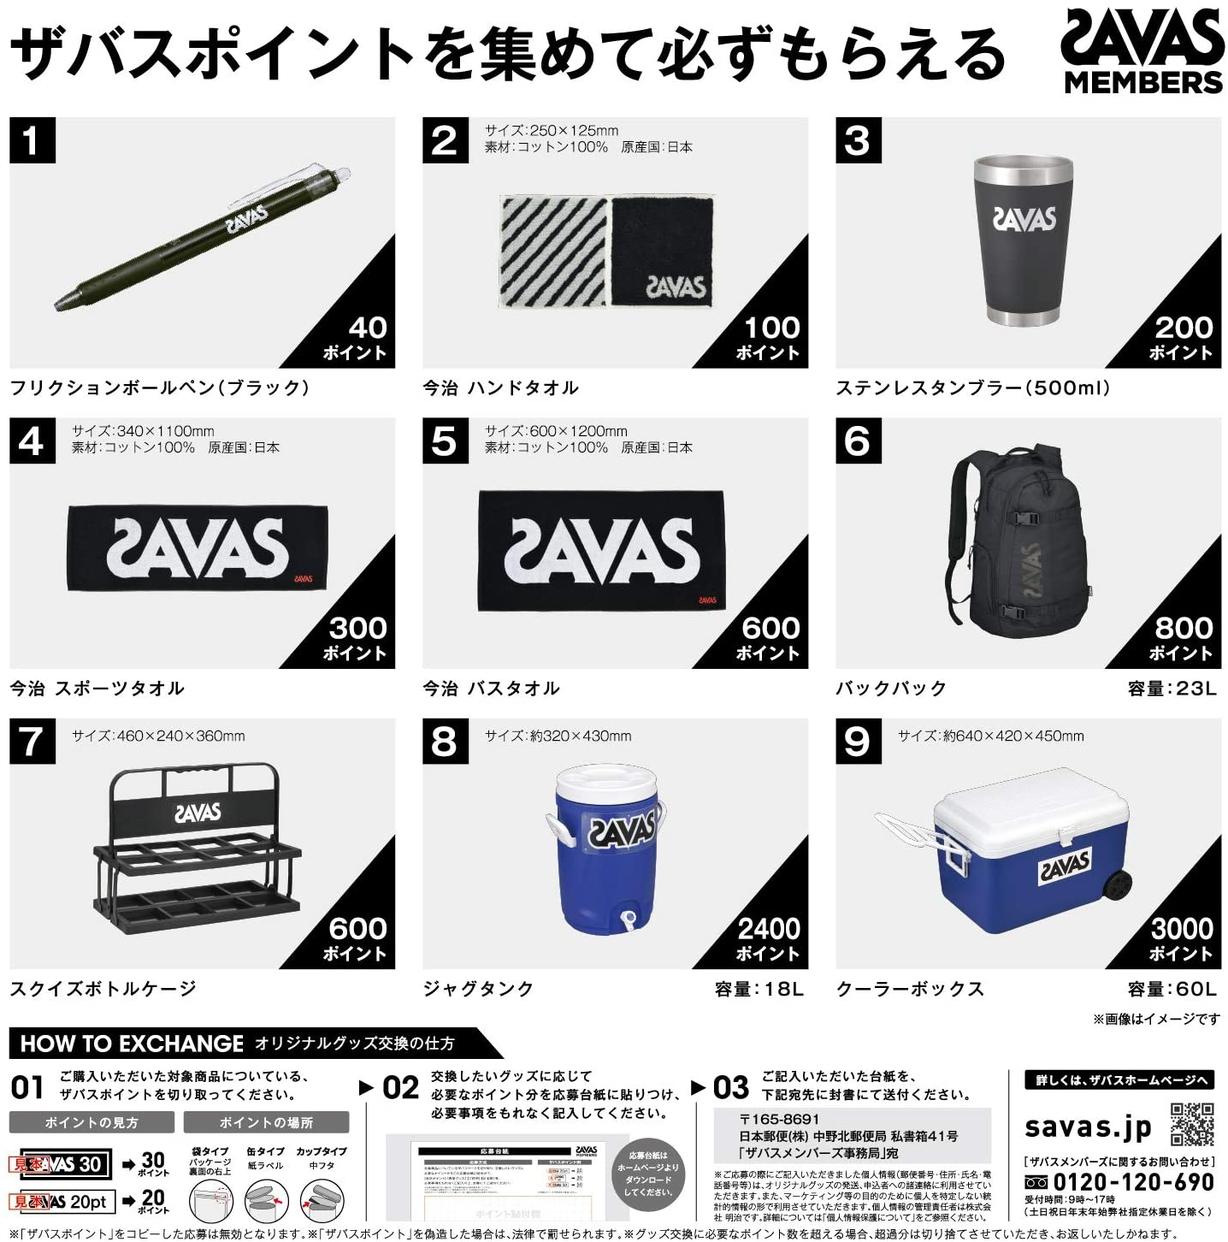 SAVAS(ザバス) ソイプロテイン100の商品画像6